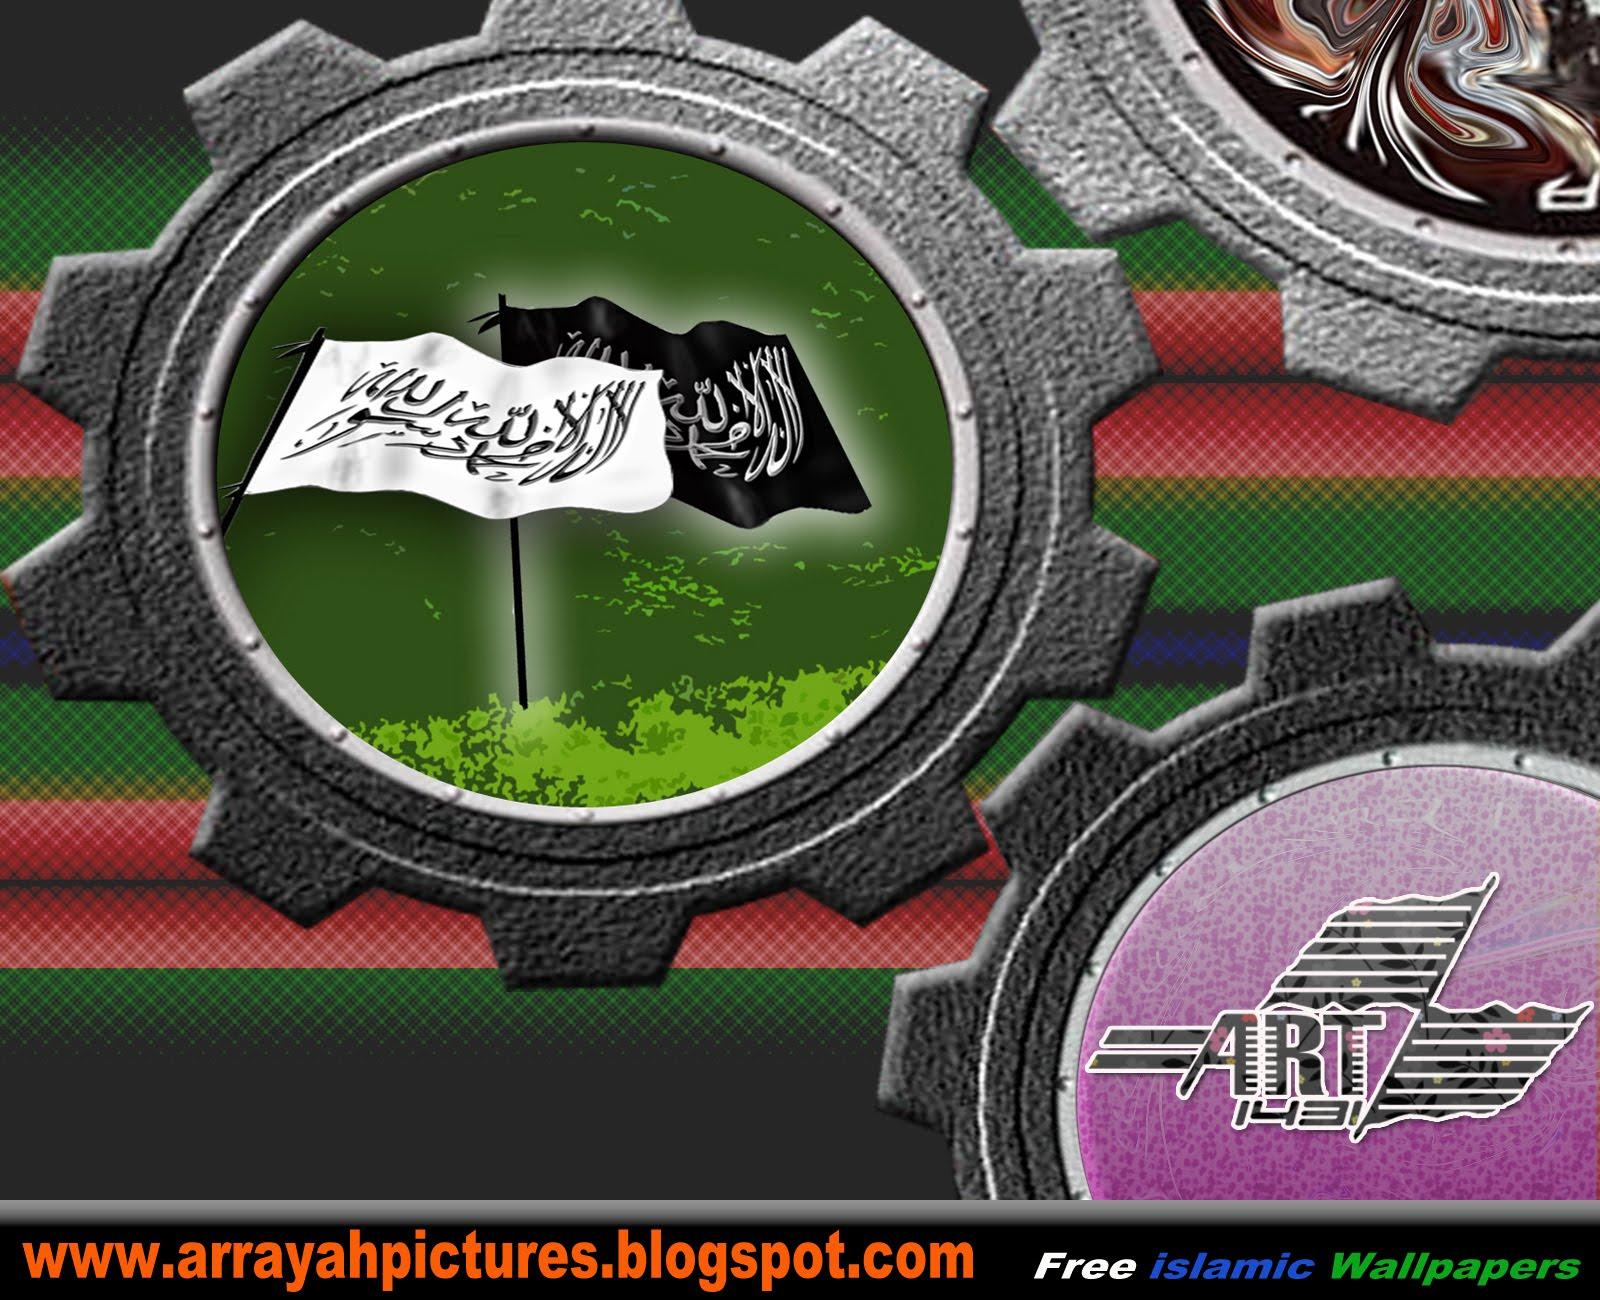 [0014+[=Z]+AR+RAYAH_VI+World_Under_One_Flag+''Gear''.jpg]